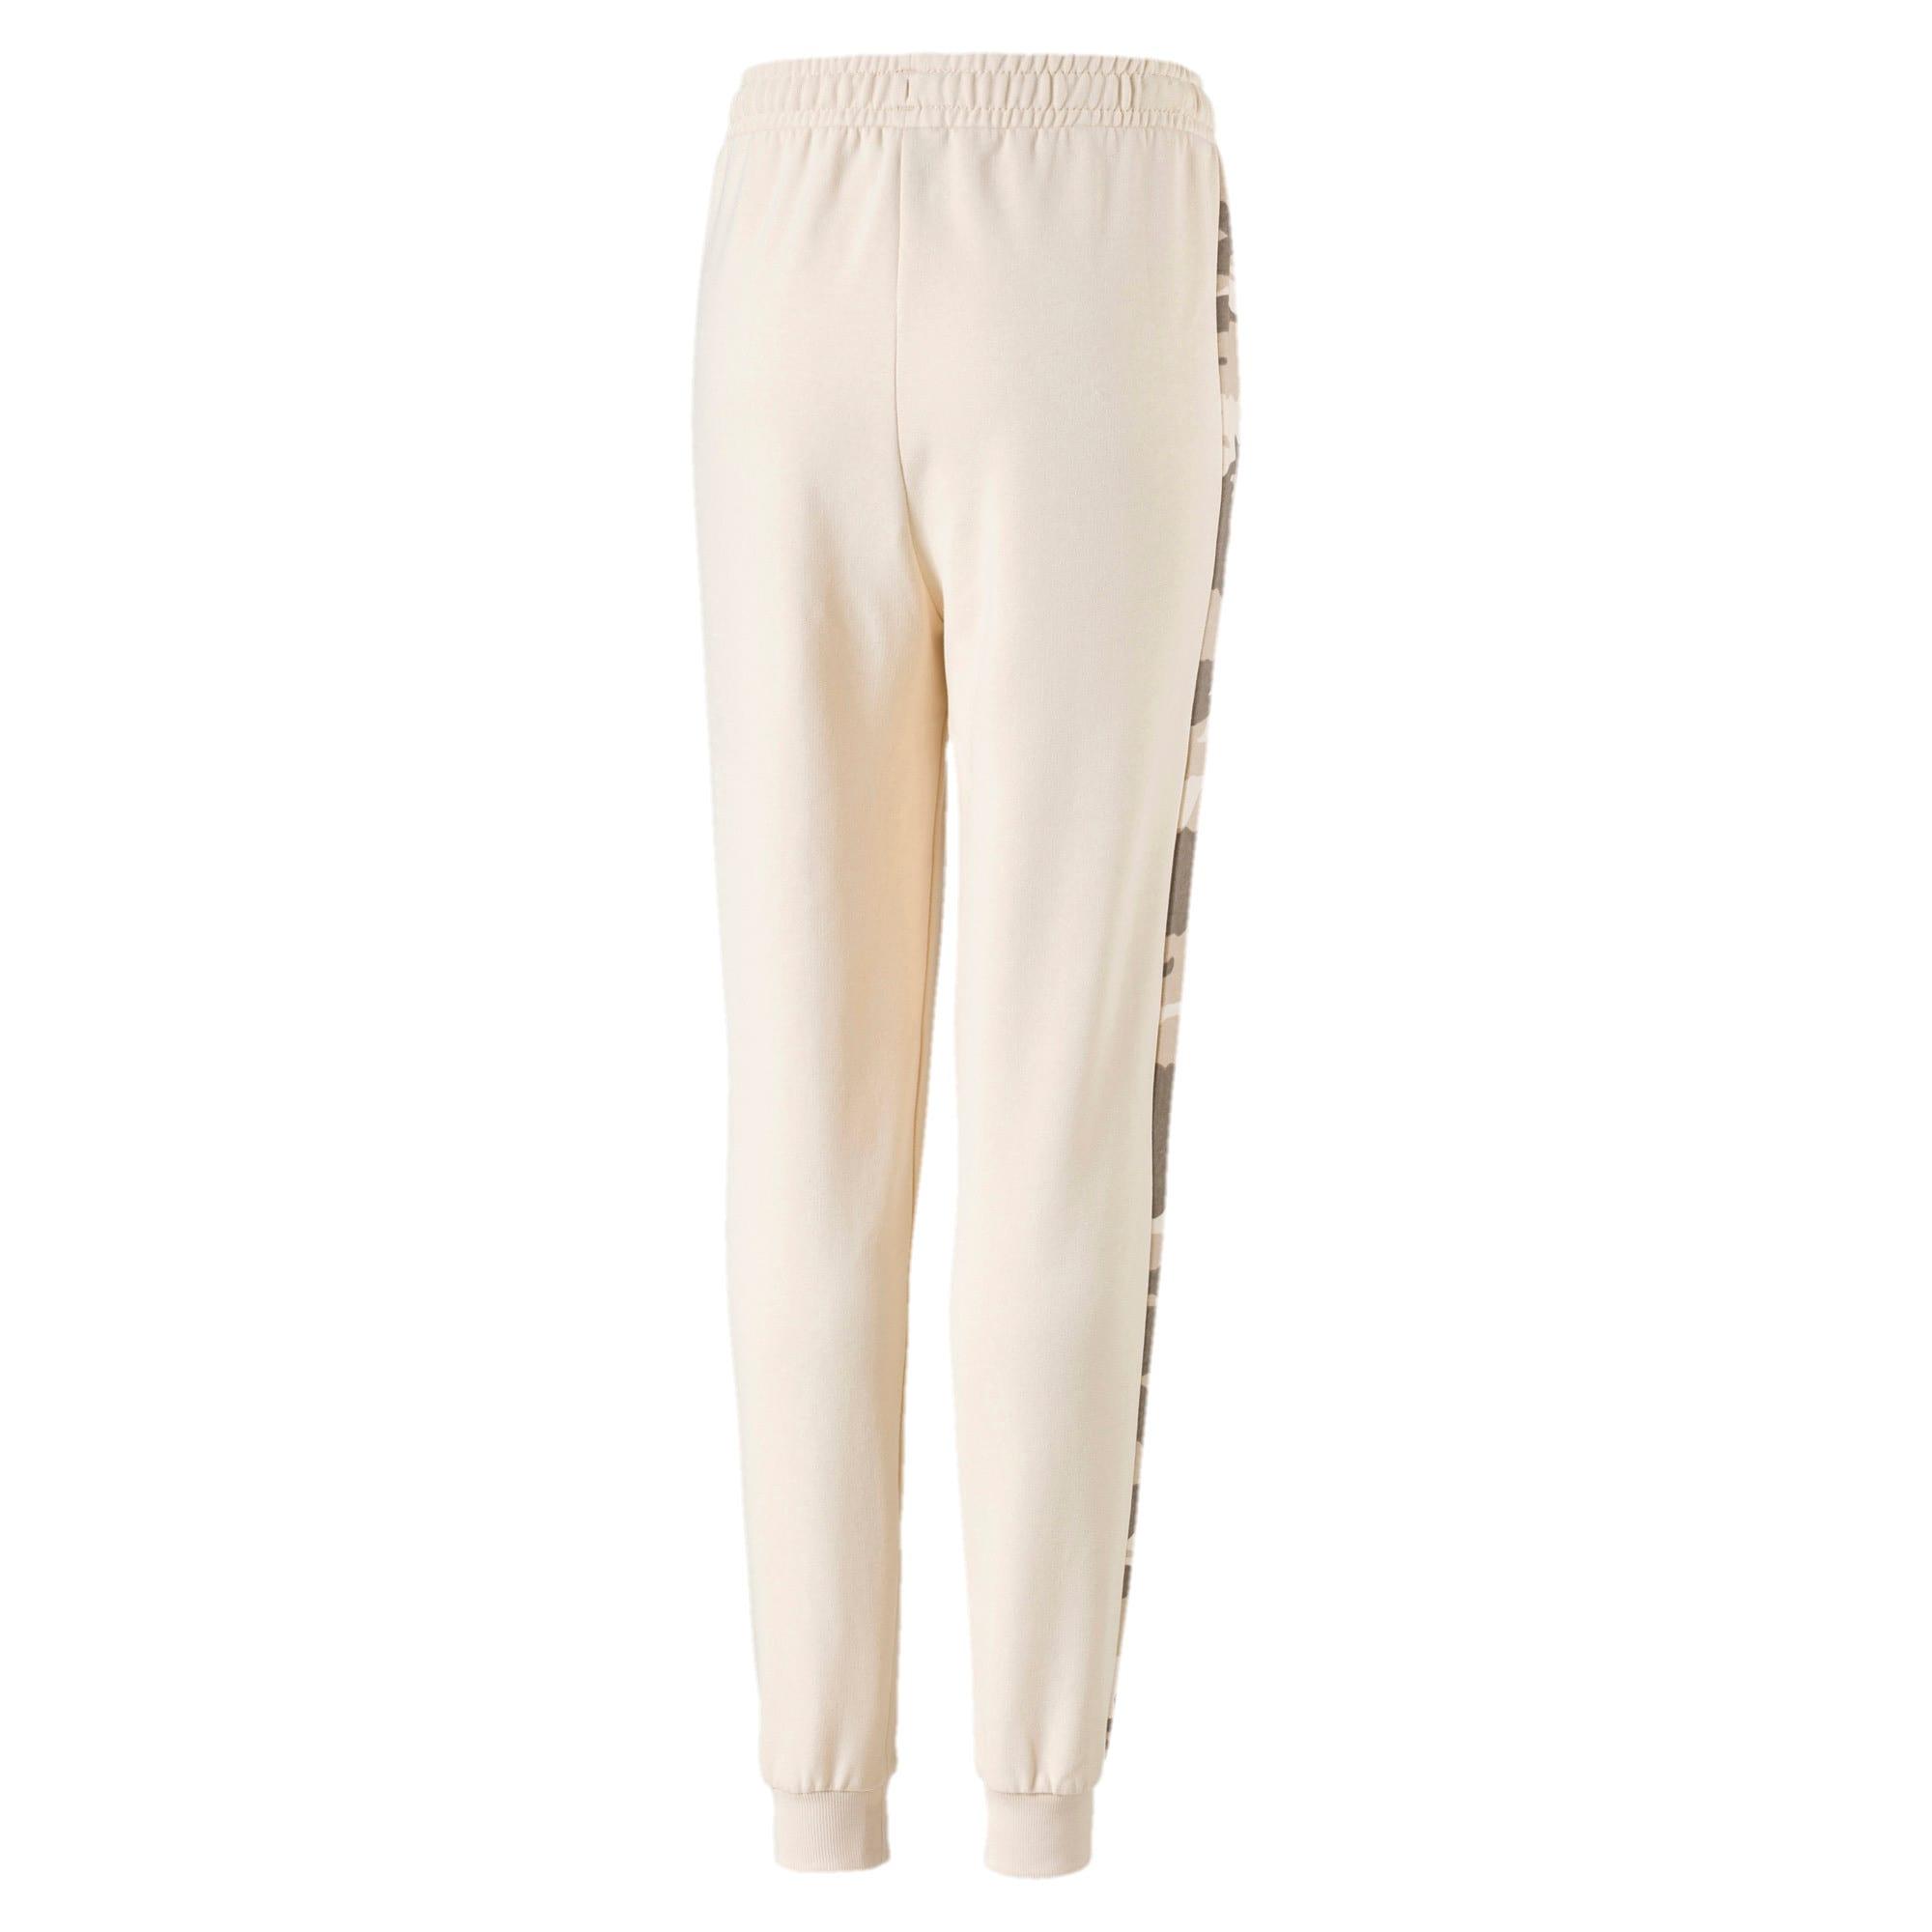 Thumbnail 2 of Toelopende streetwear sweatpants voor kinderen, White Swan, medium